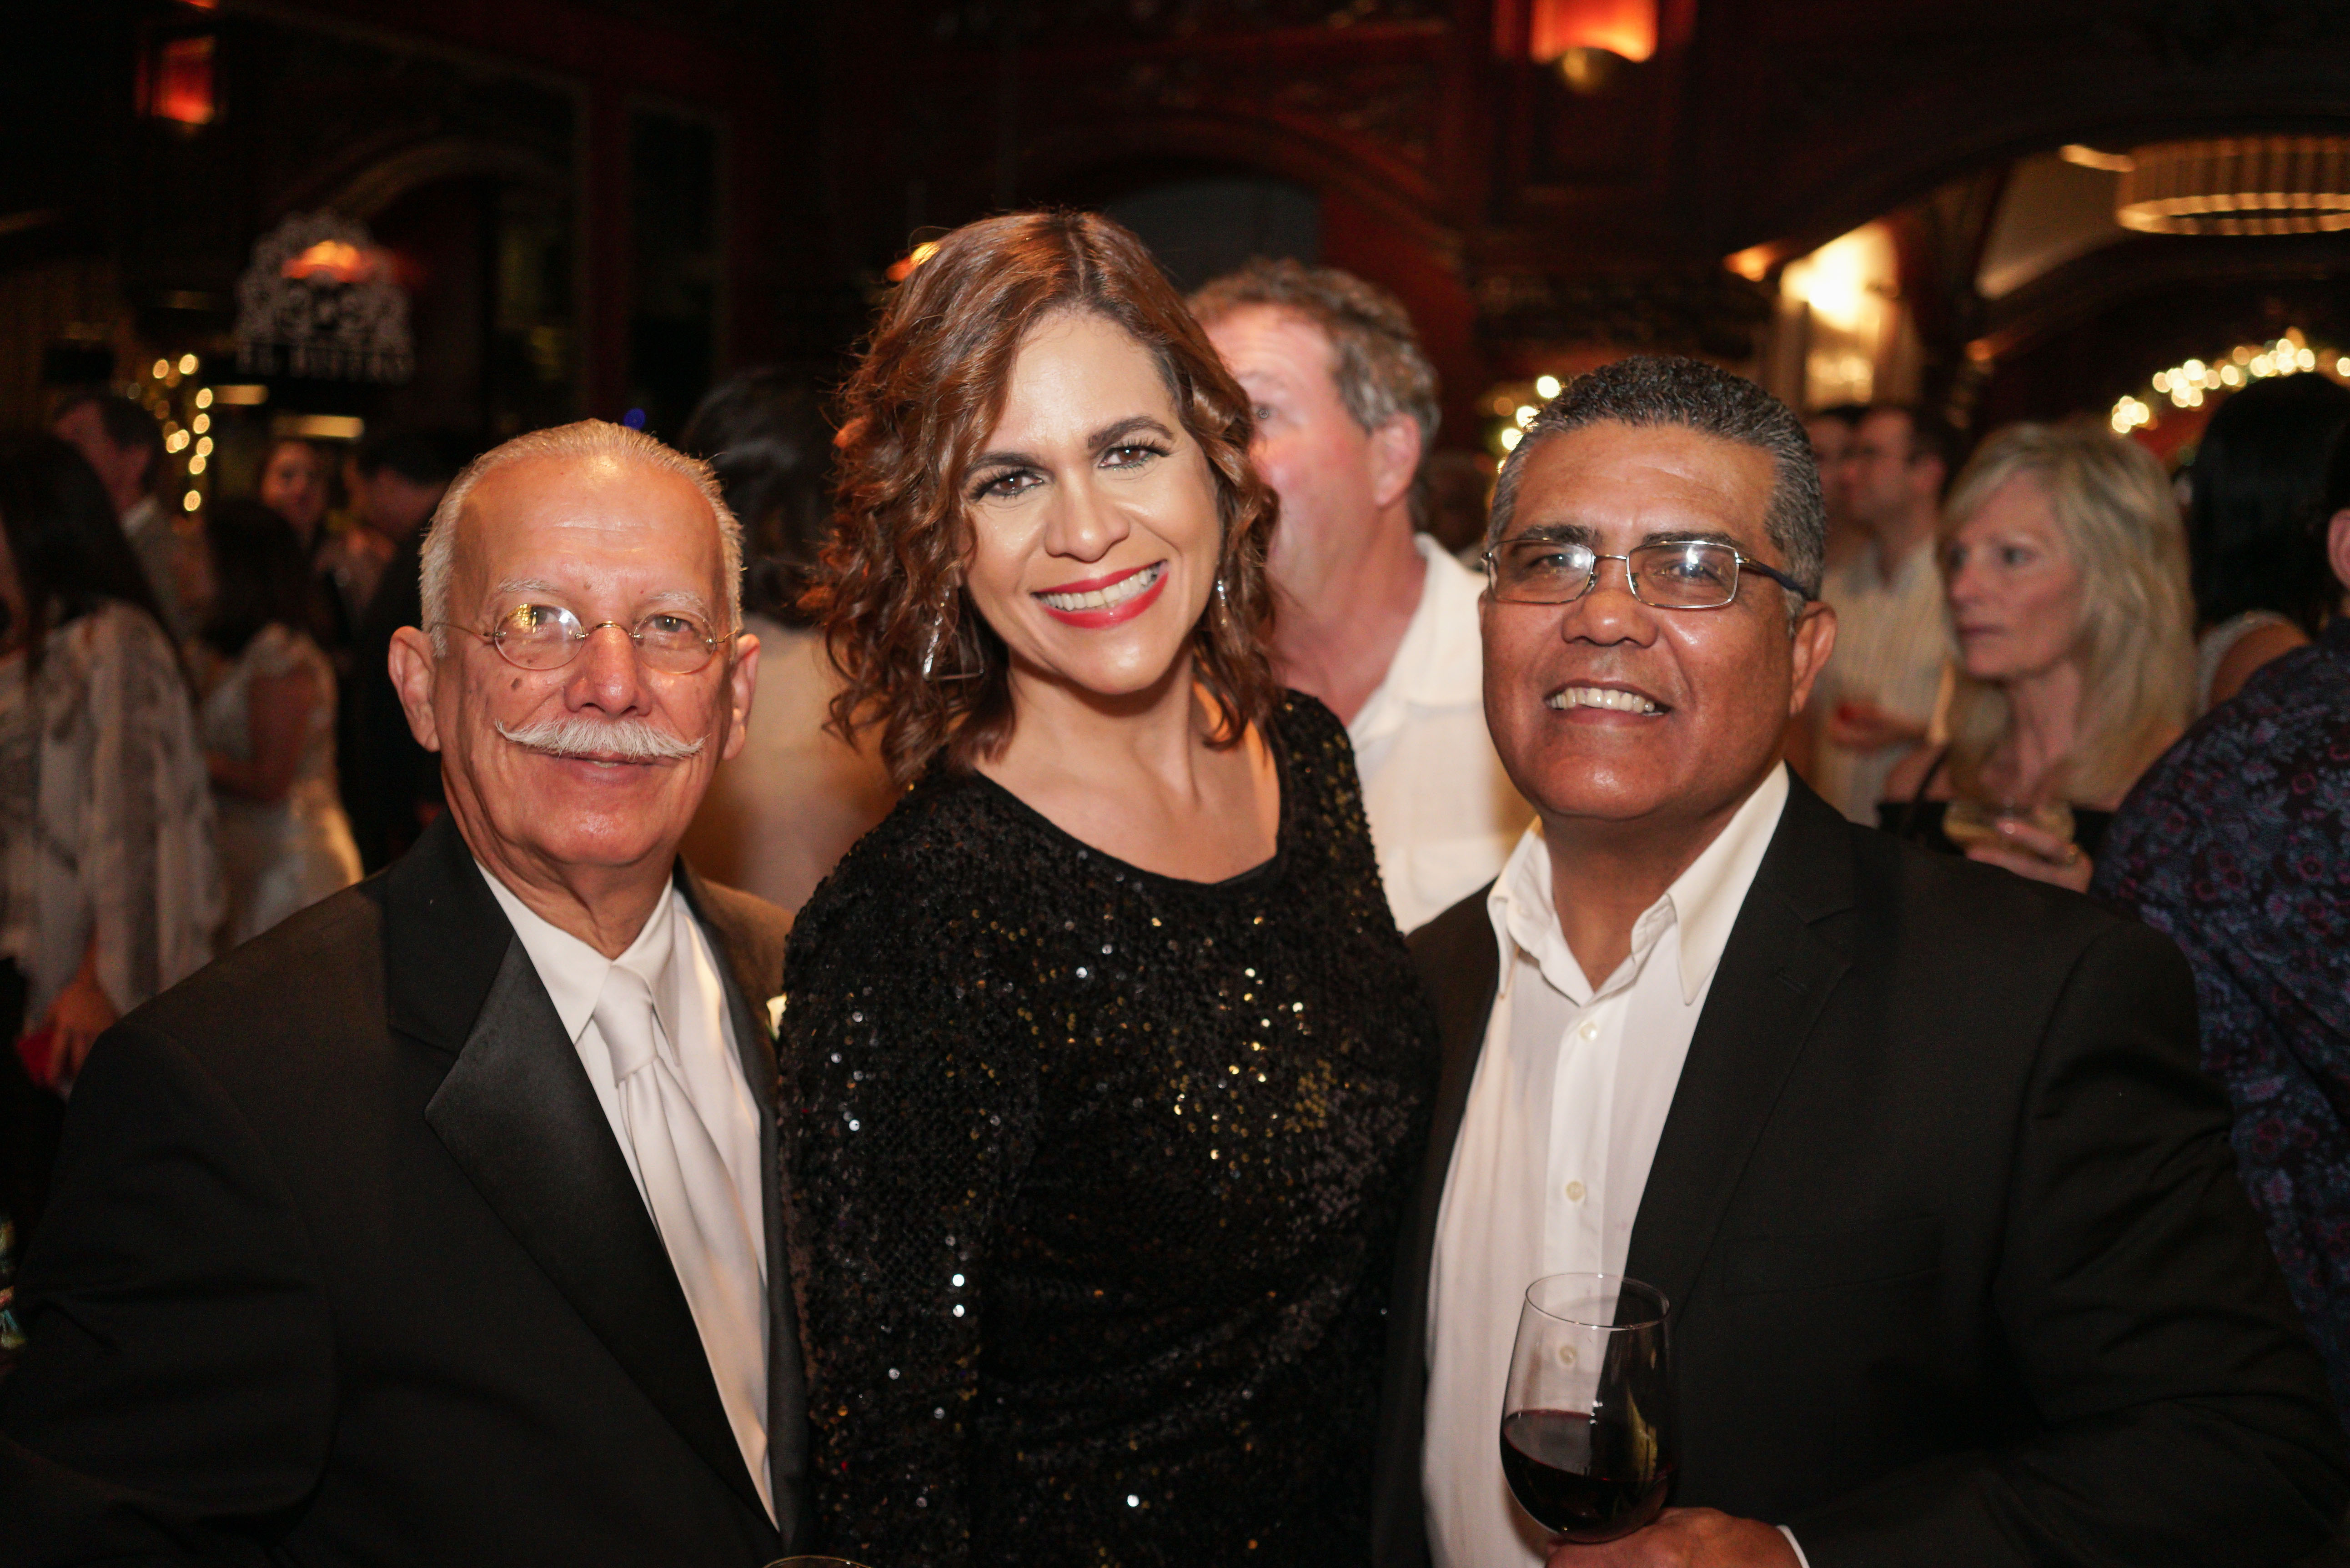 Rafael Soto, Waleska González y Luvi Gallejas. (Suministrada)